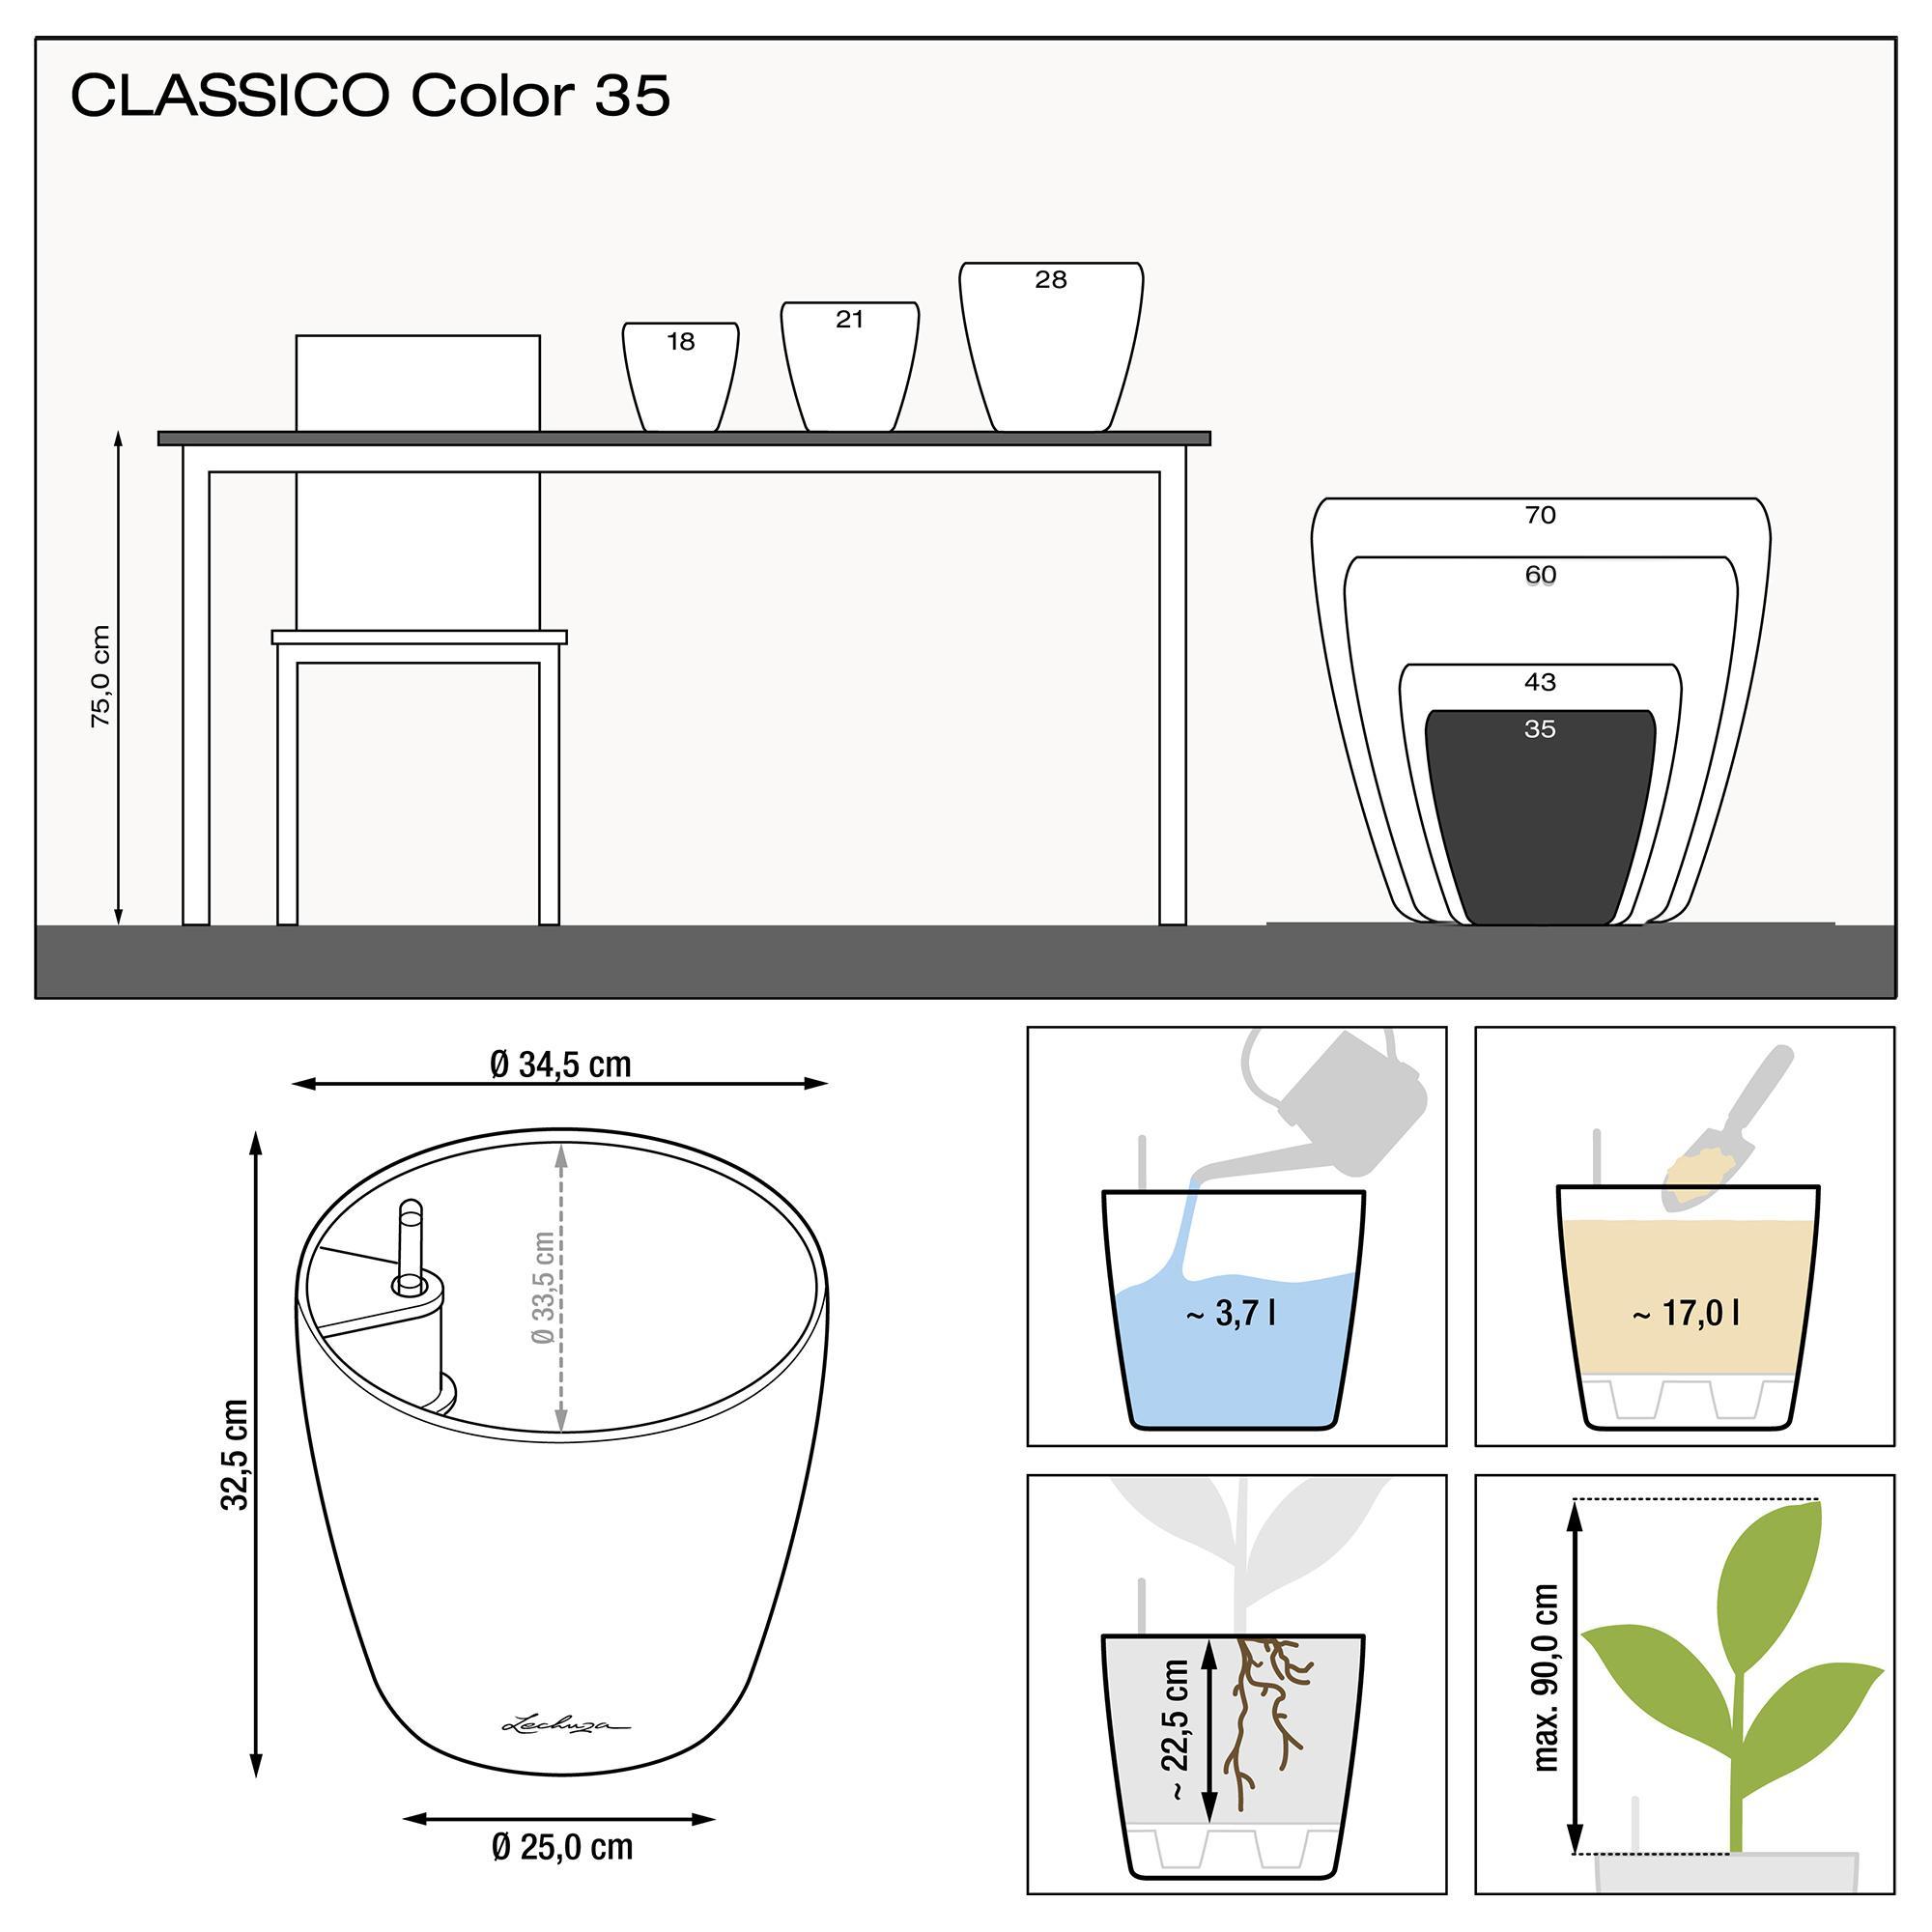 CLASSICO Color 35 slate - Image 2